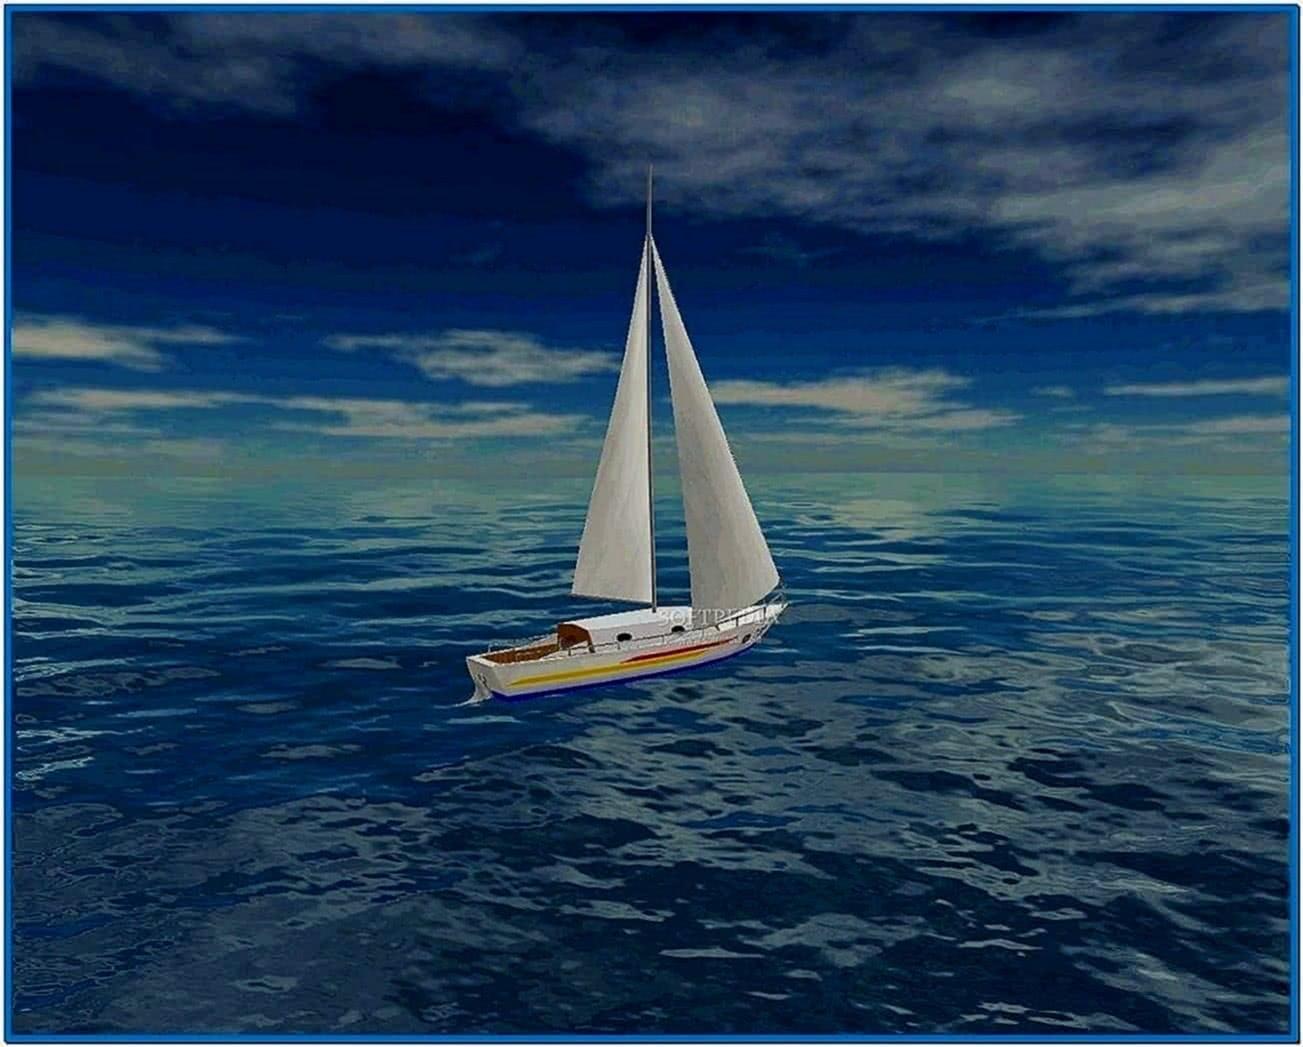 Sea Yacht Cruise 3D Screensaver